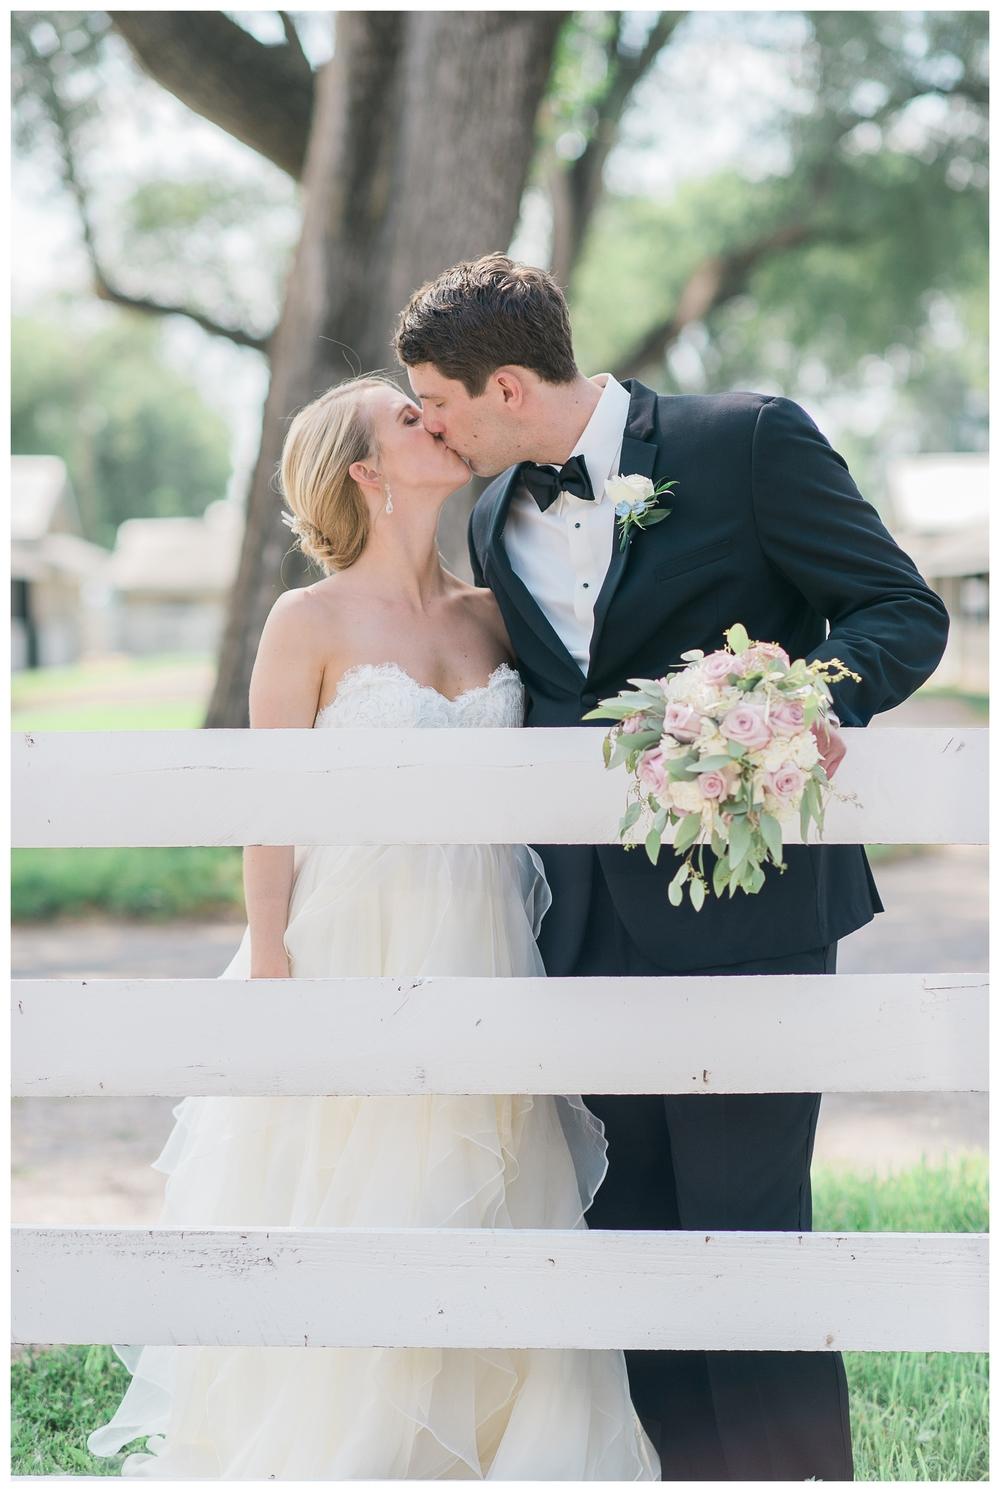 Rebecca_Bridges_Photography_Indianapolis_Wedding_Photographer_4567.jpg